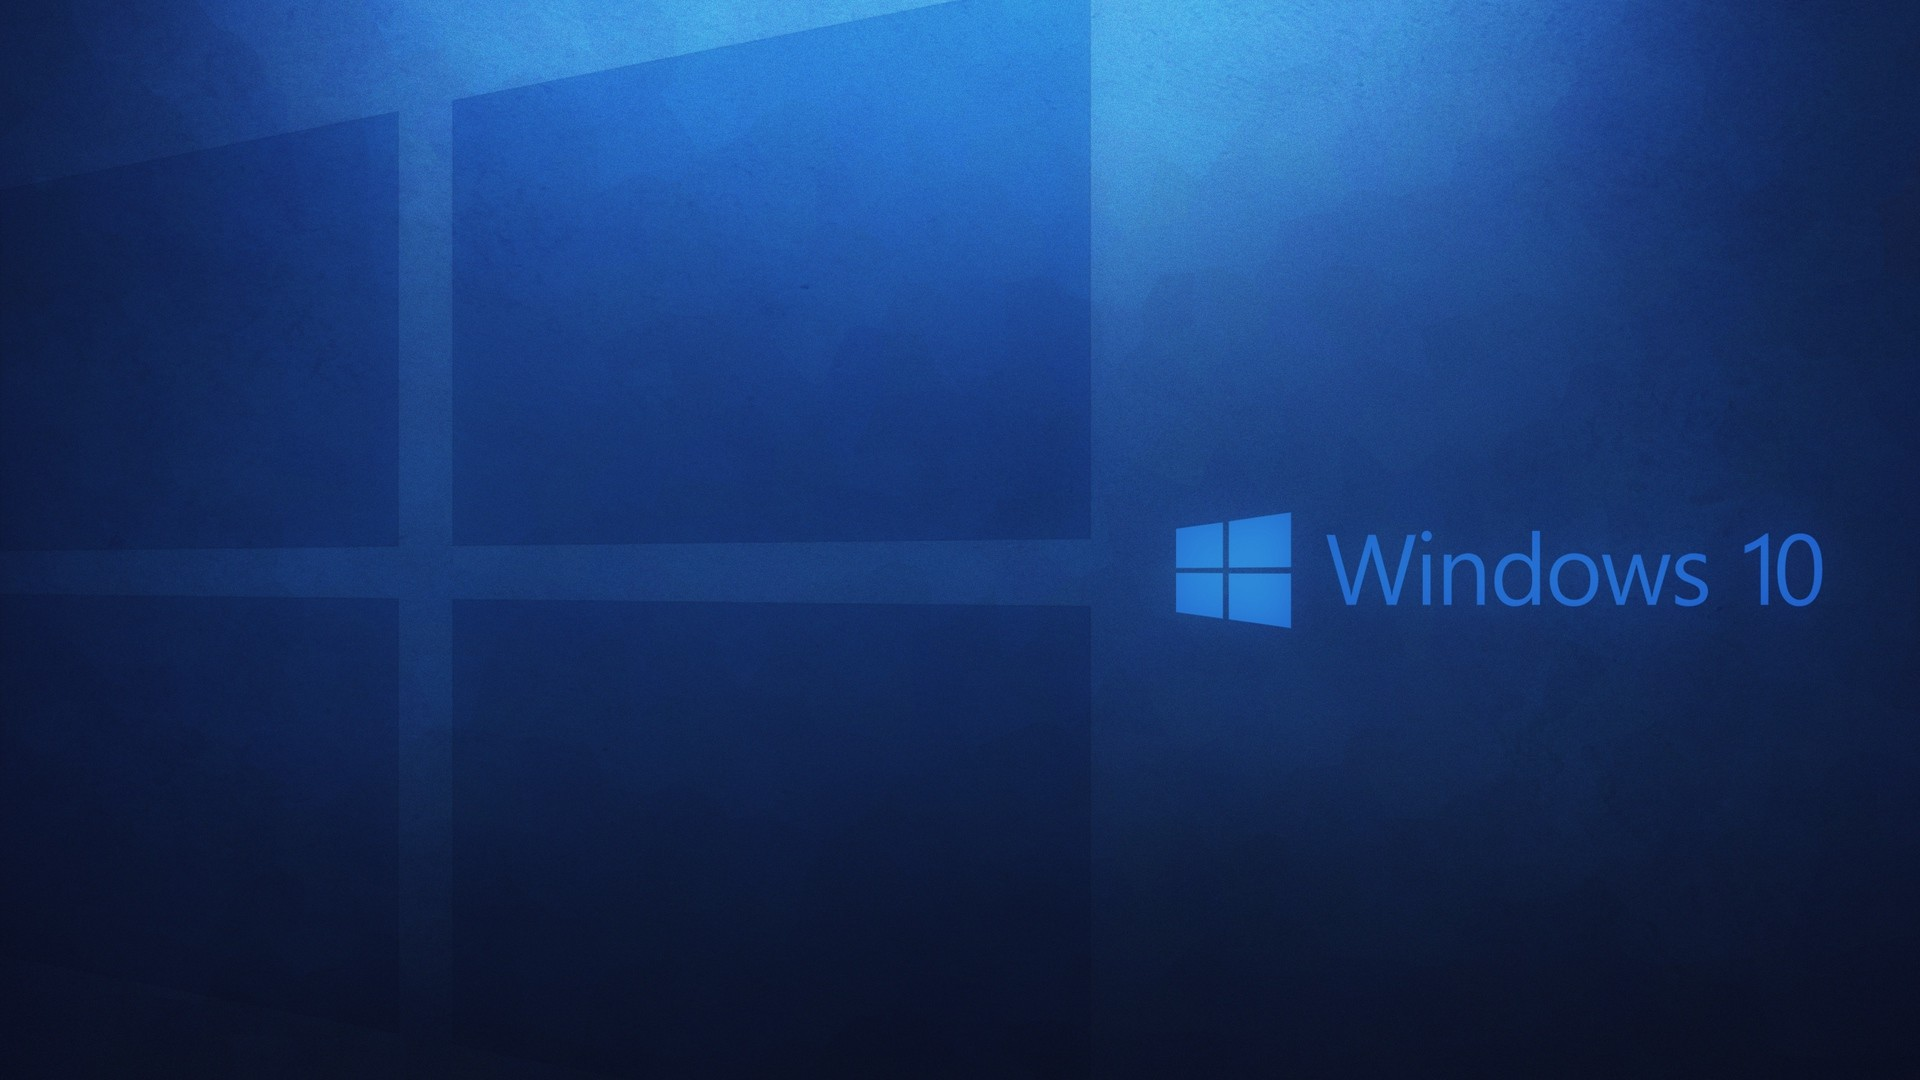 Windows 10 Full Hd Wallpaper 83 Images